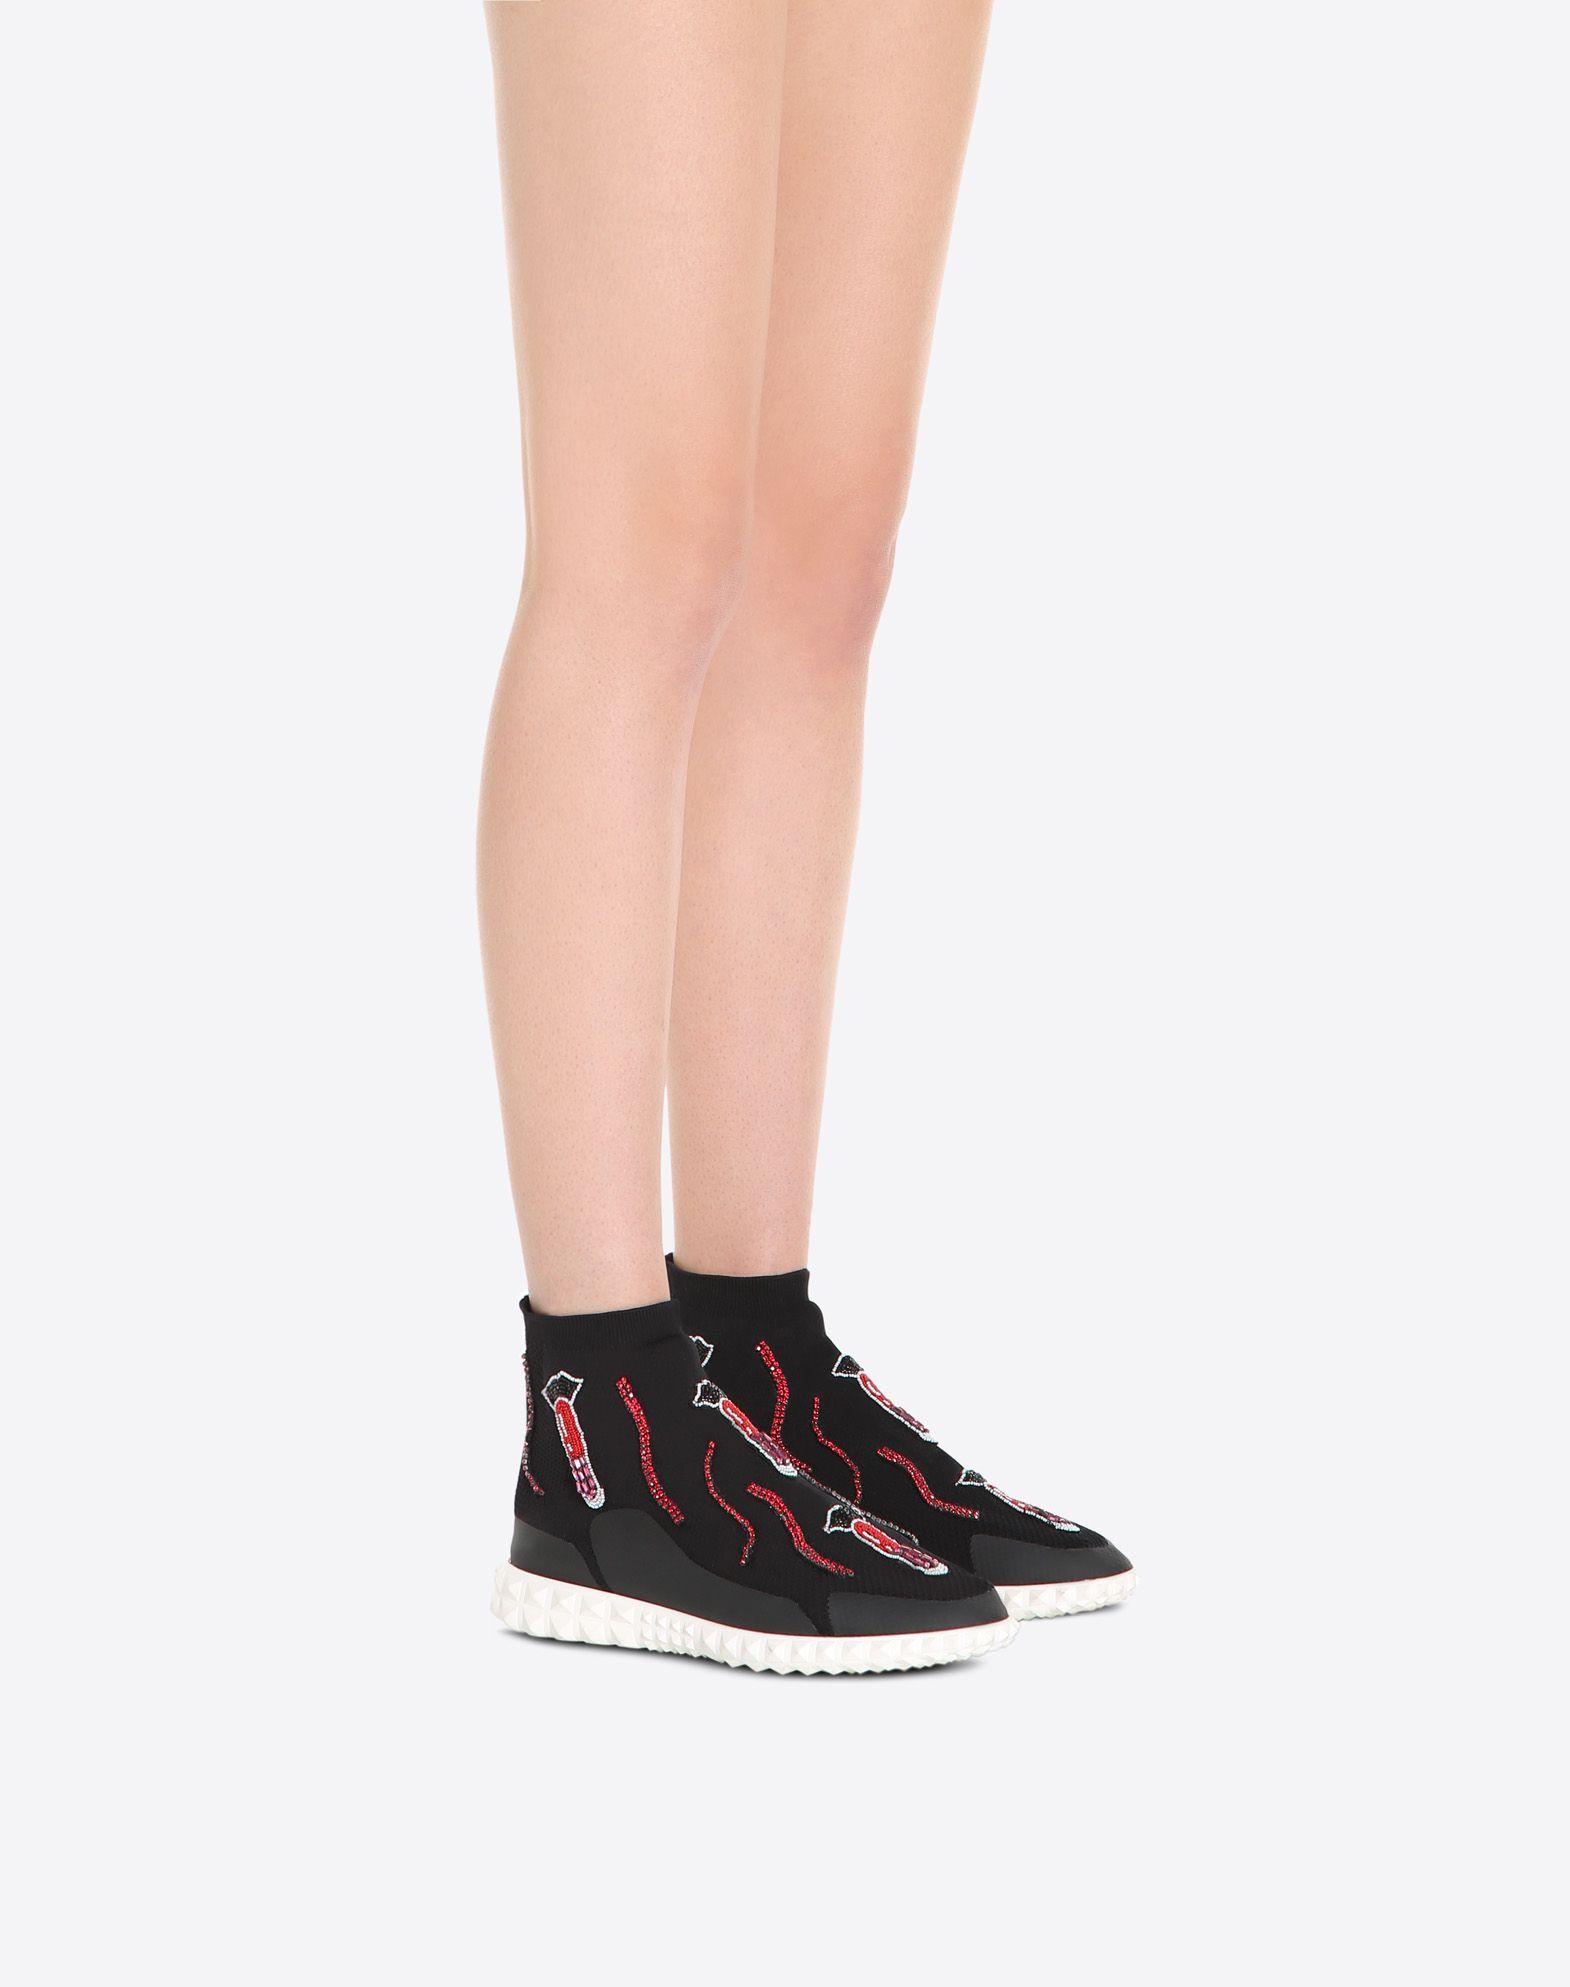 VALENTINO GARAVANI Embroidered Sneaker HIGH-TOP SNEAKER D a